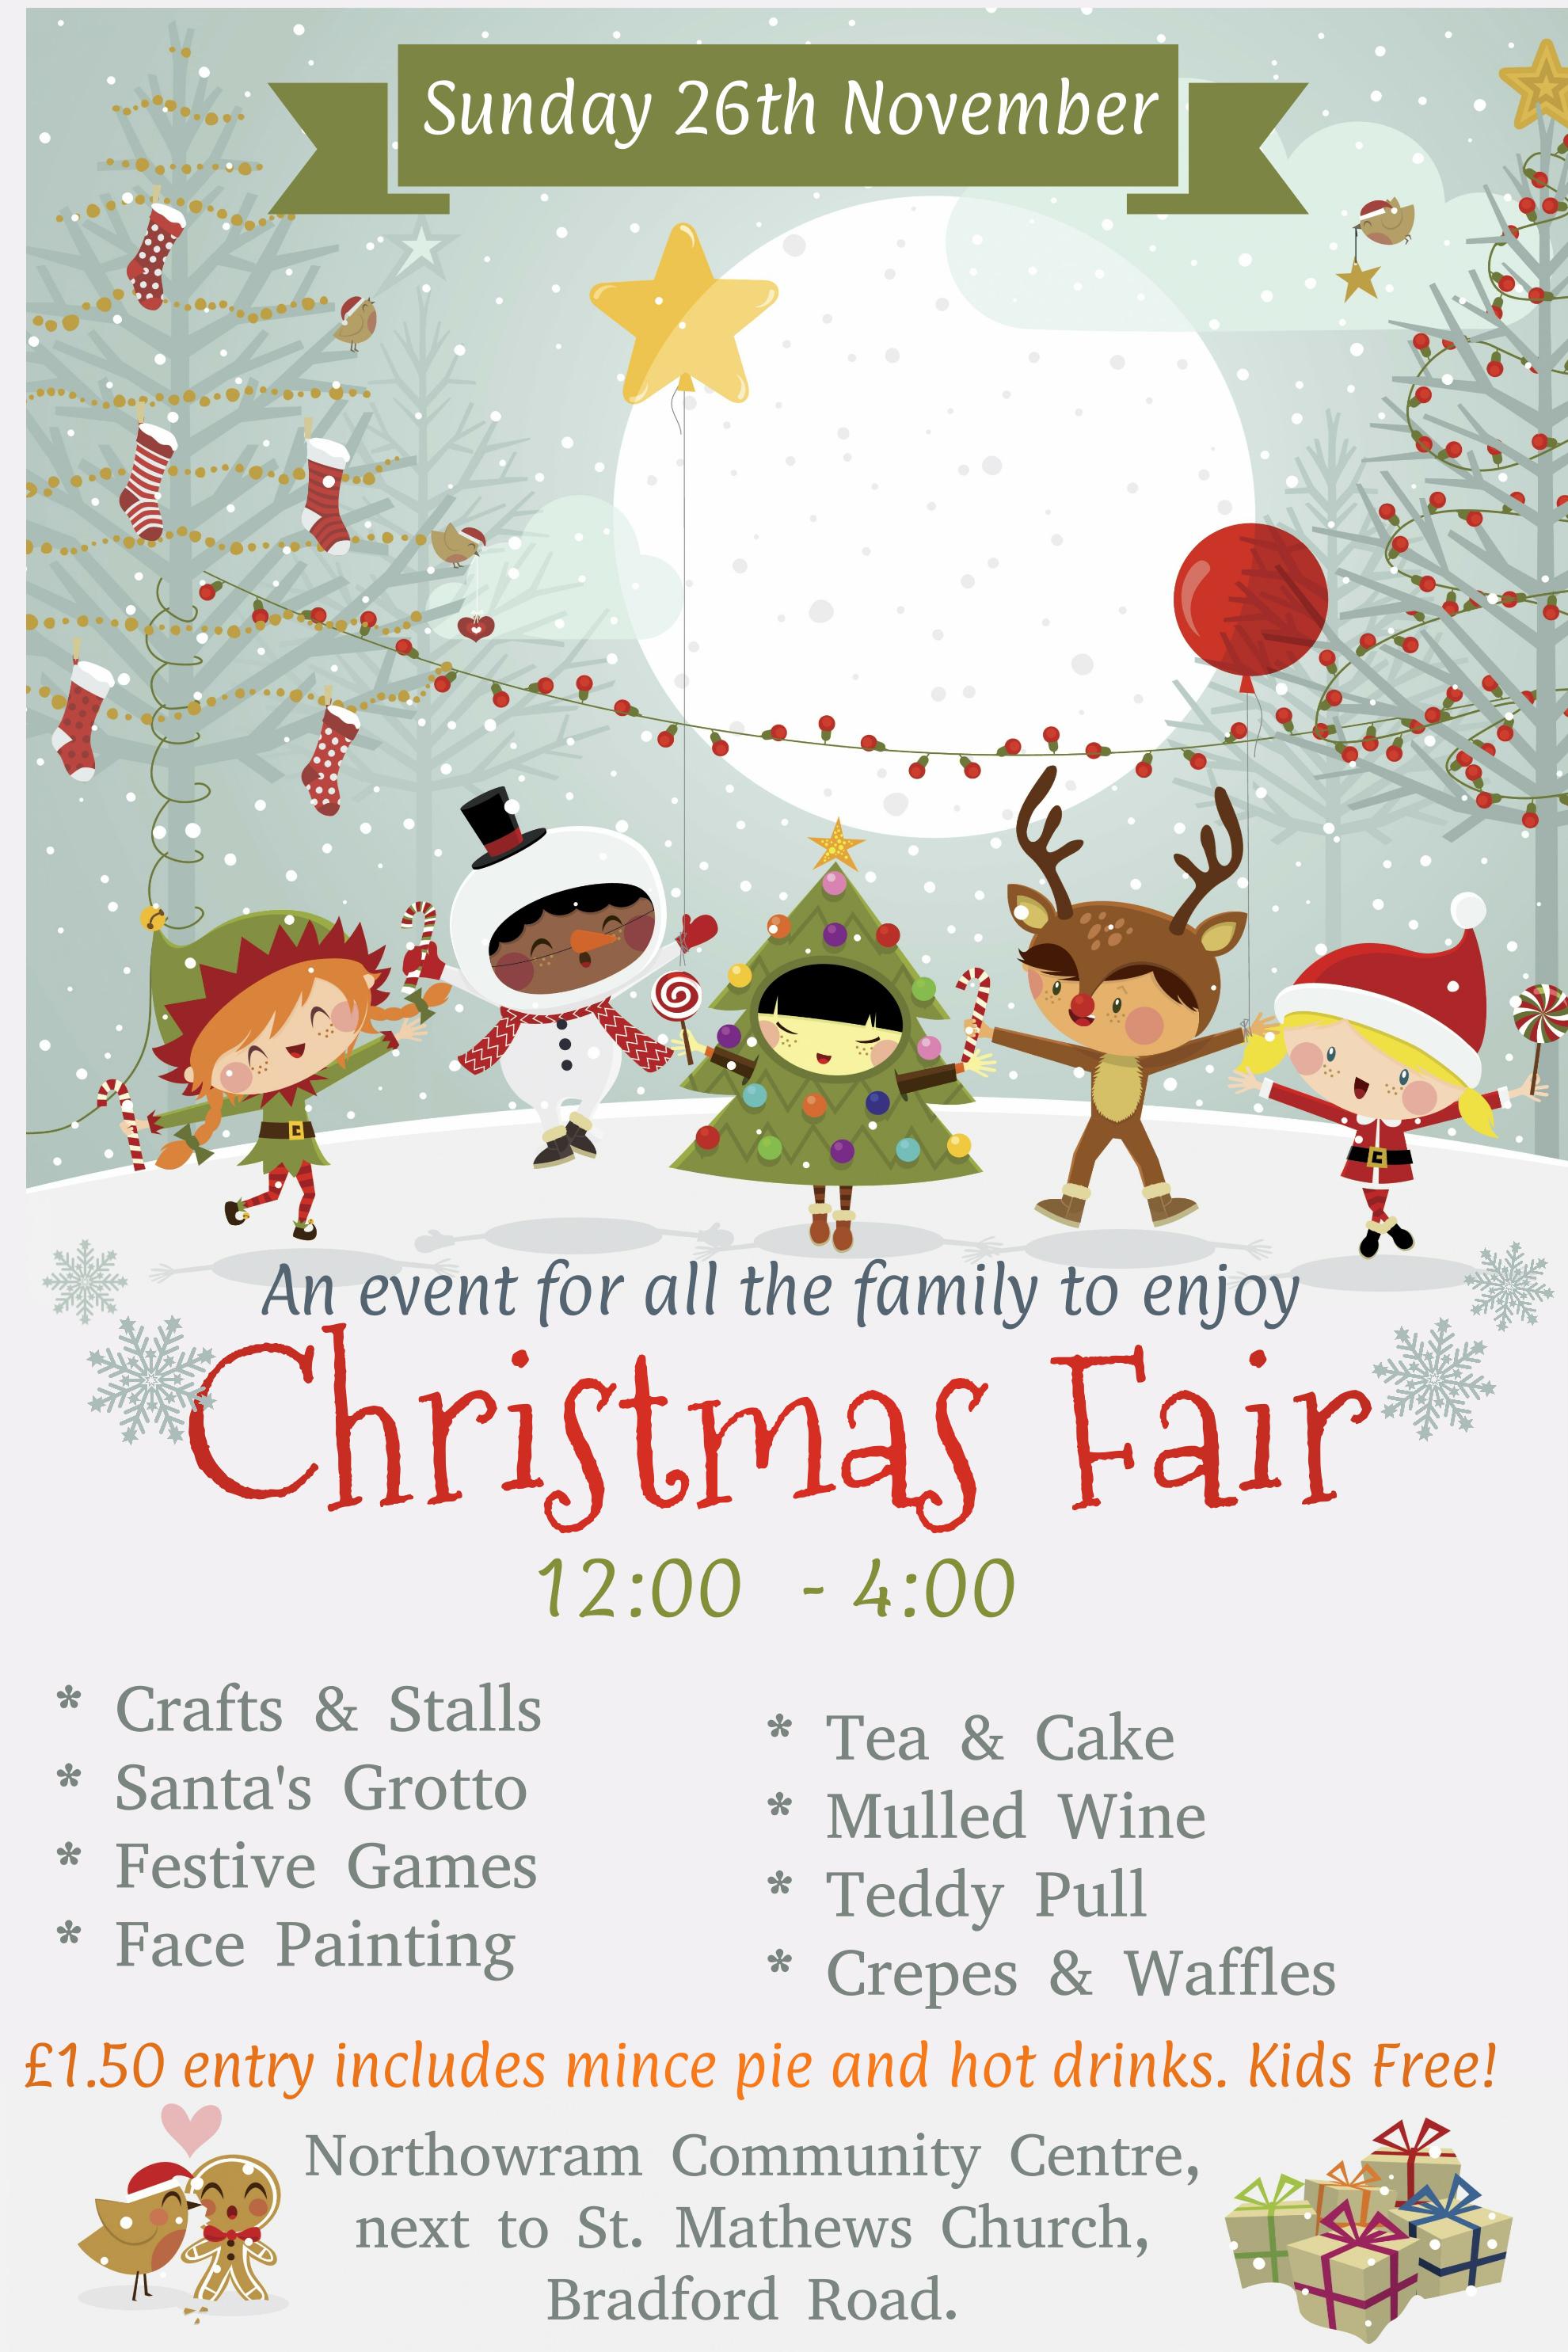 Christmas Craft Show Flyer.Christmas Craft Fair At Northowram Community Centre